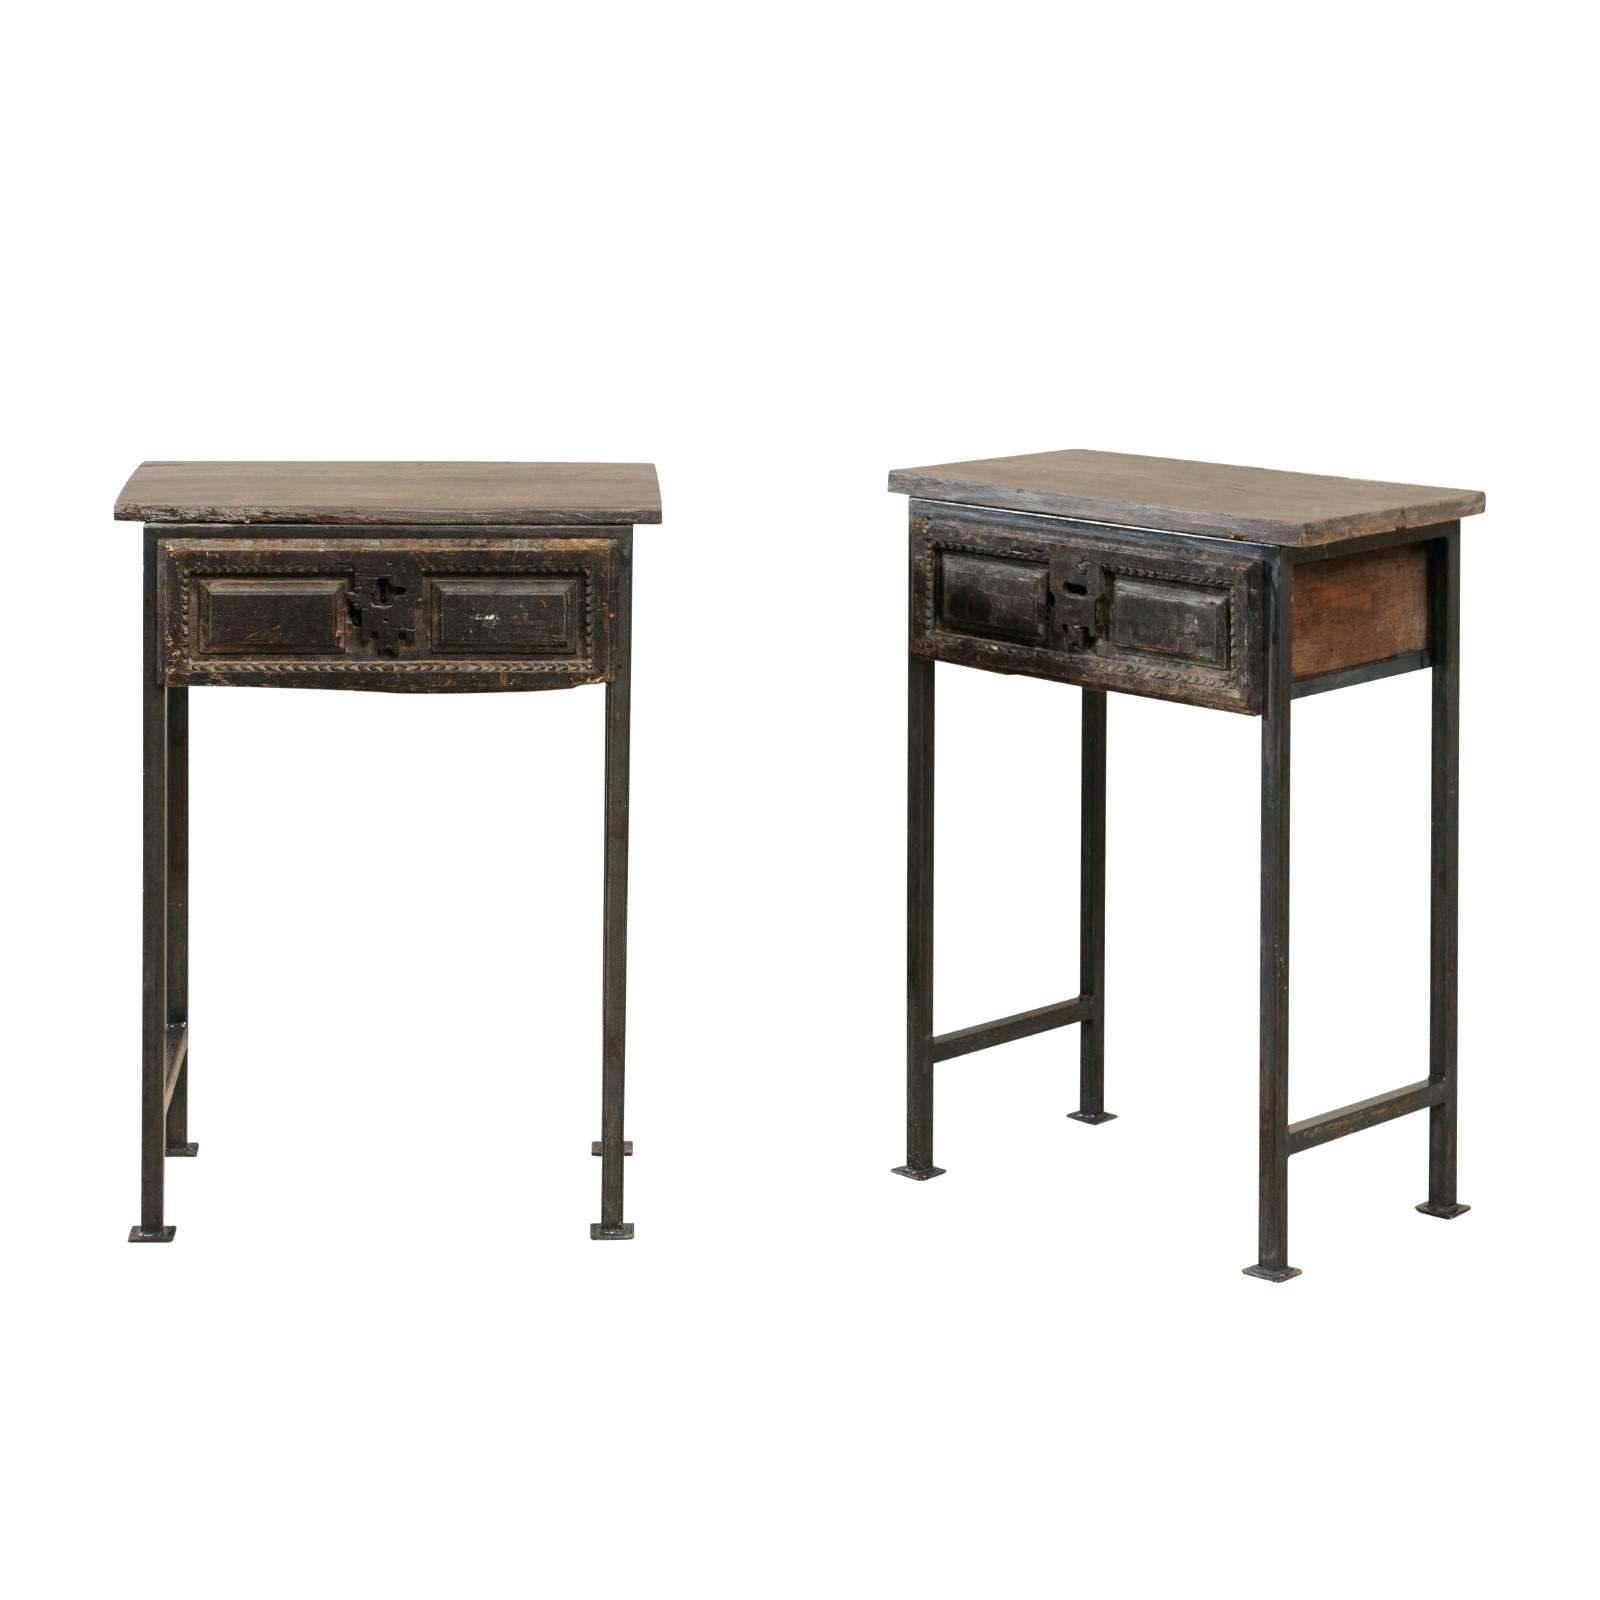 2020 Burnham Reclaimed Wood And Iron Round Coffee Tables Regarding Side Tables ~ Iron And Wood Side Table Pair Of Century (View 1 of 20)